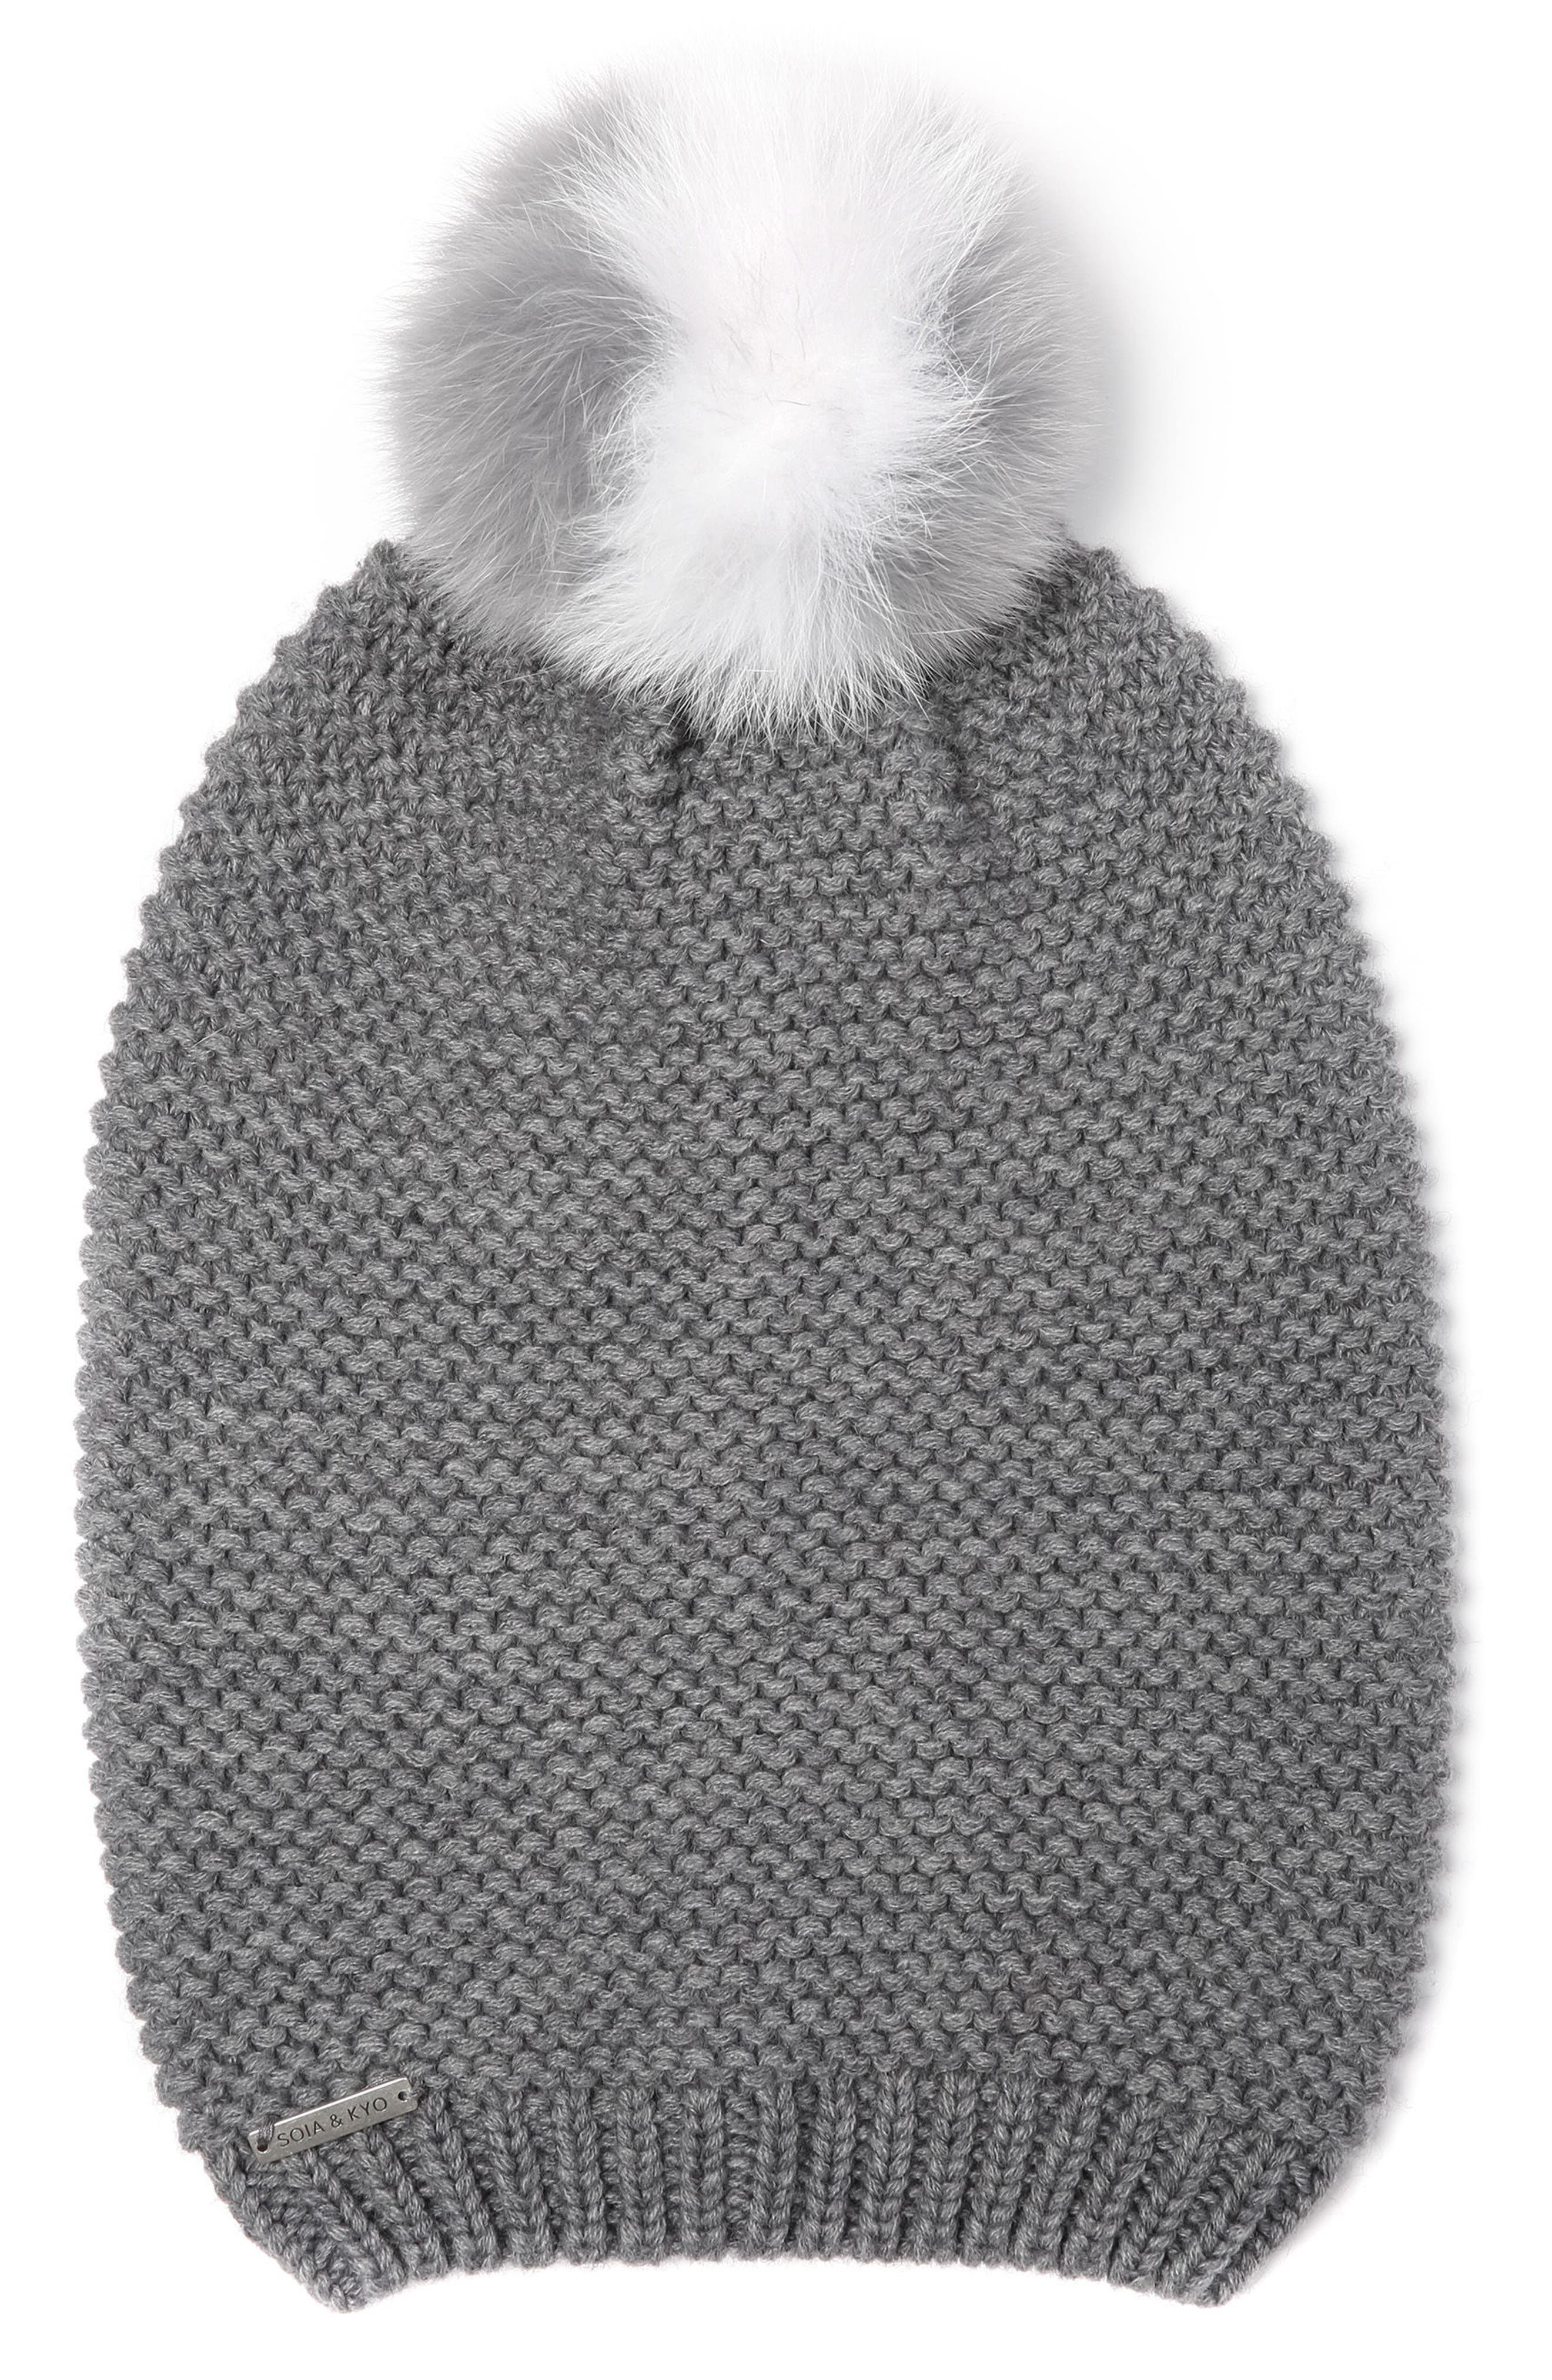 Alternate Image 1 Selected - Soia & Kyo Slouchy Knit Beanie with Genuine Fox Fur Pompom